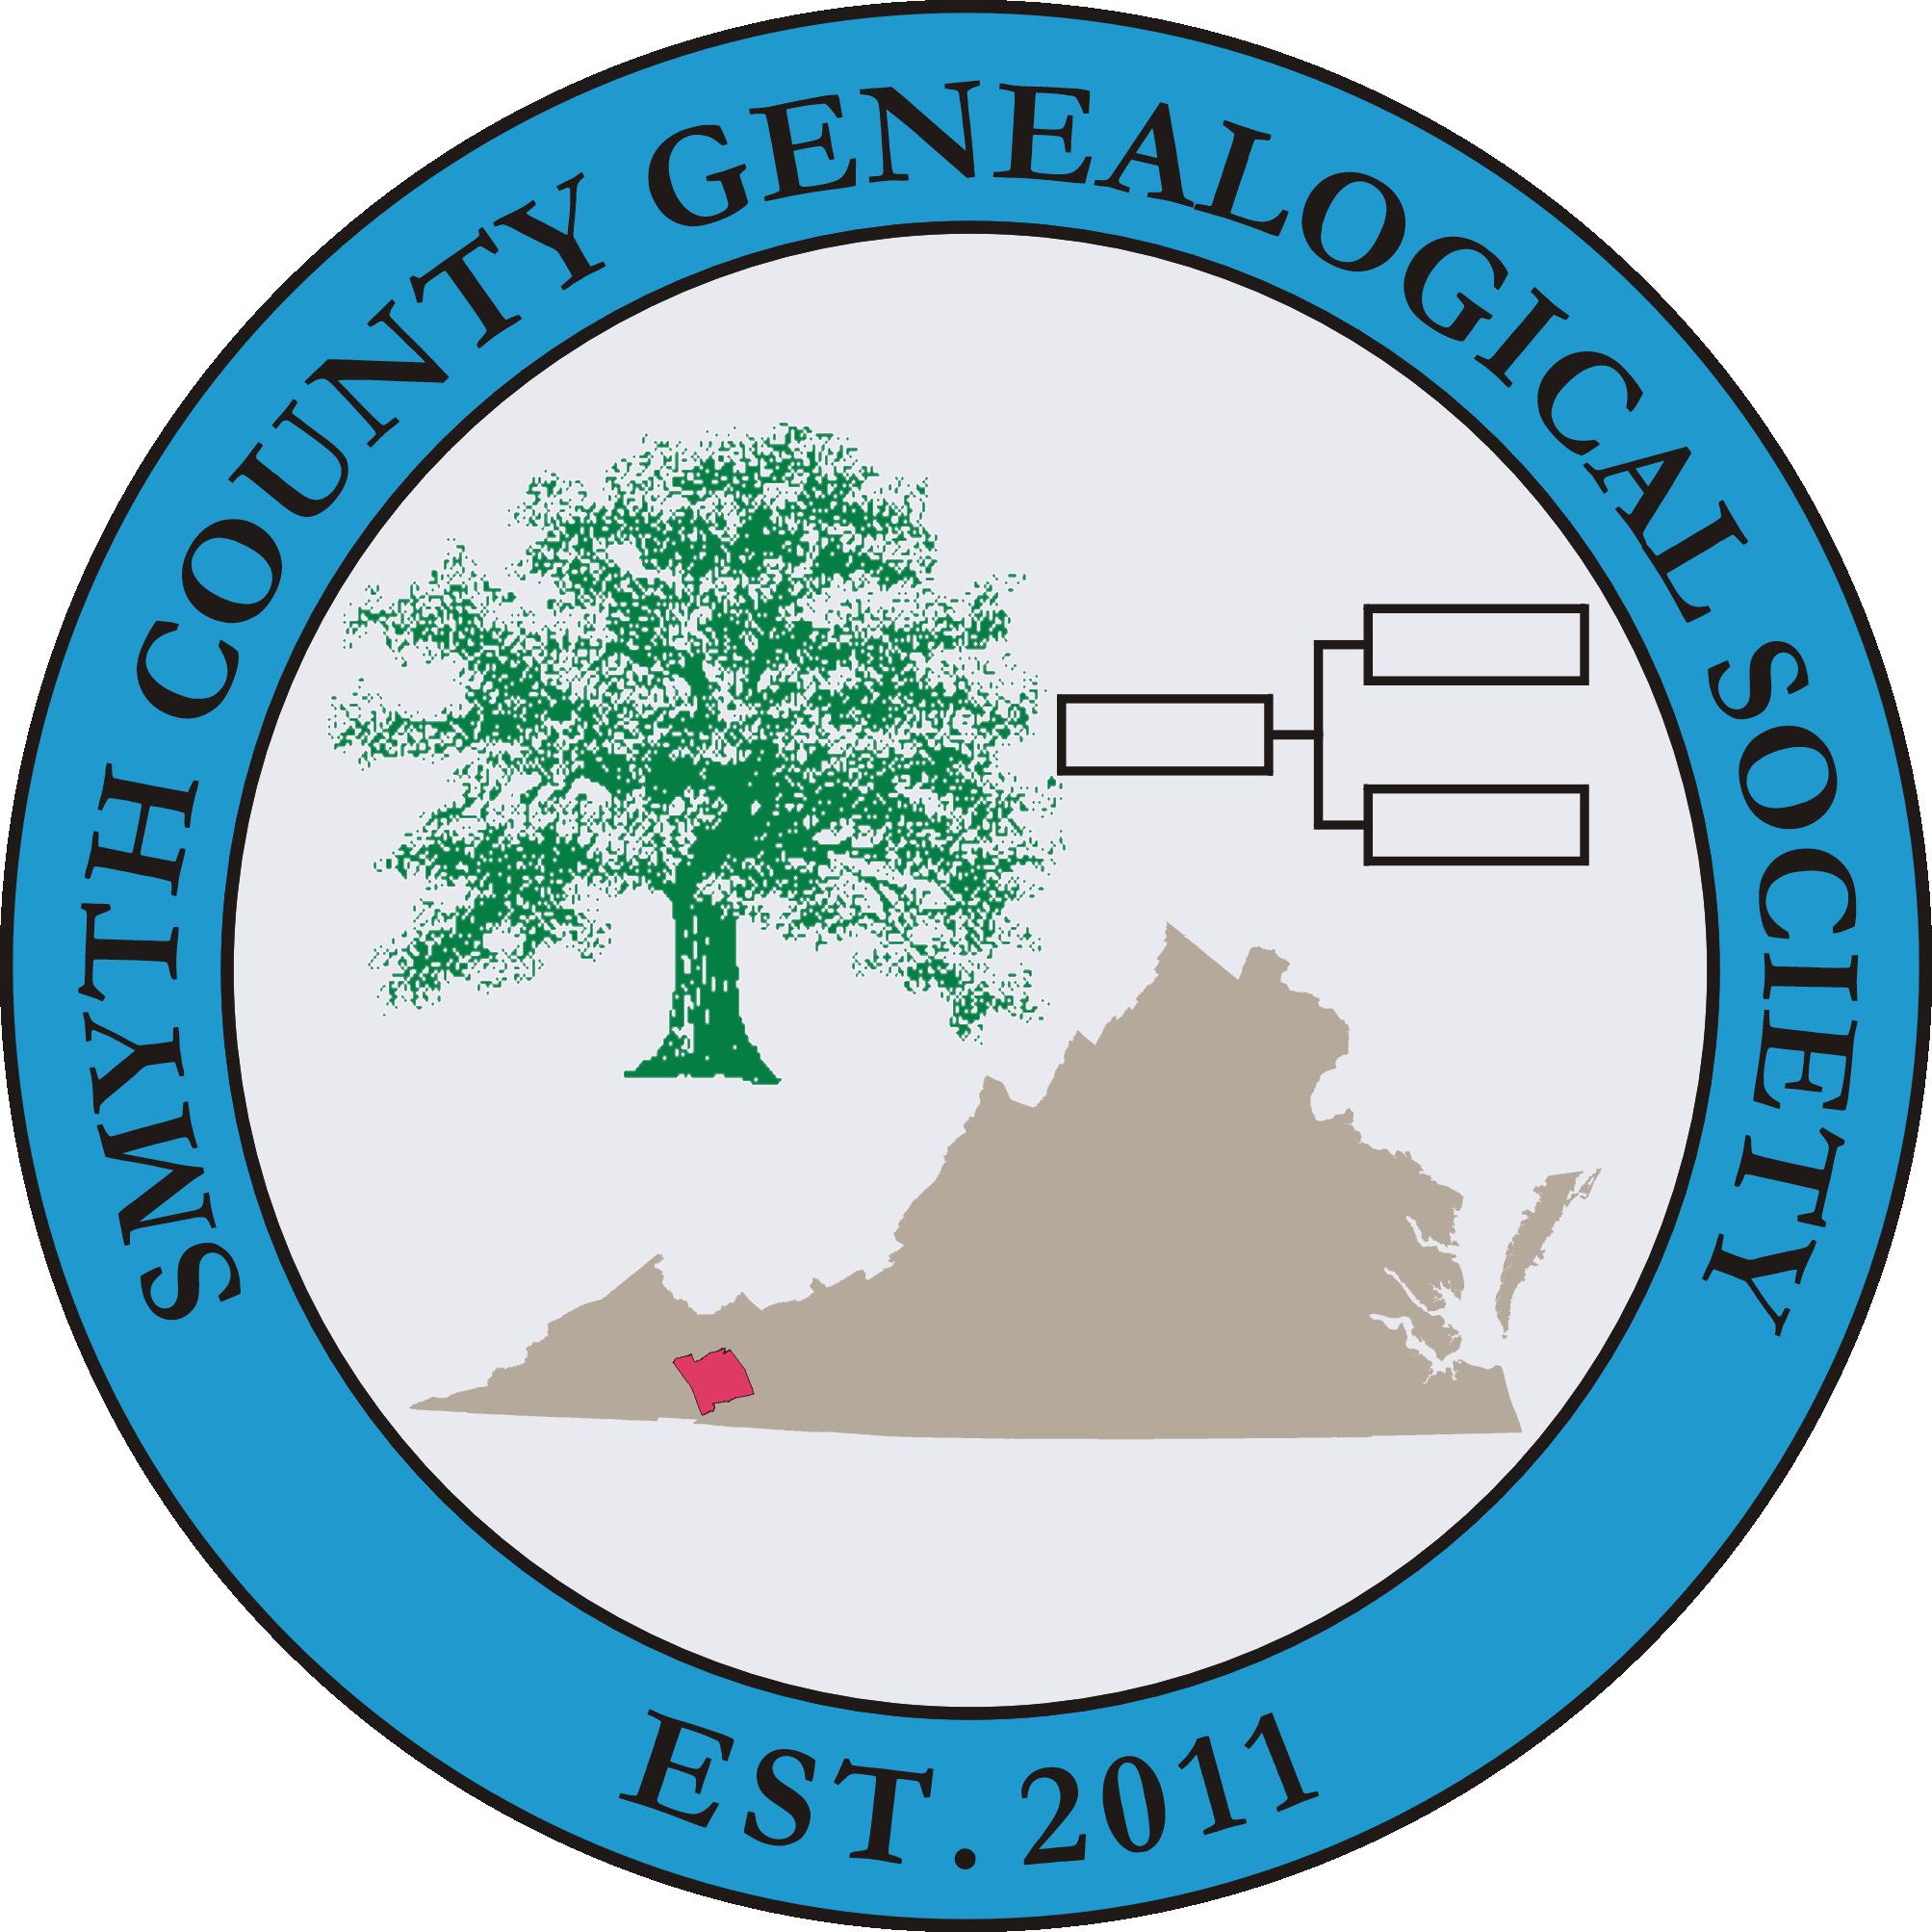 Smyth County Genealogical Society Logo